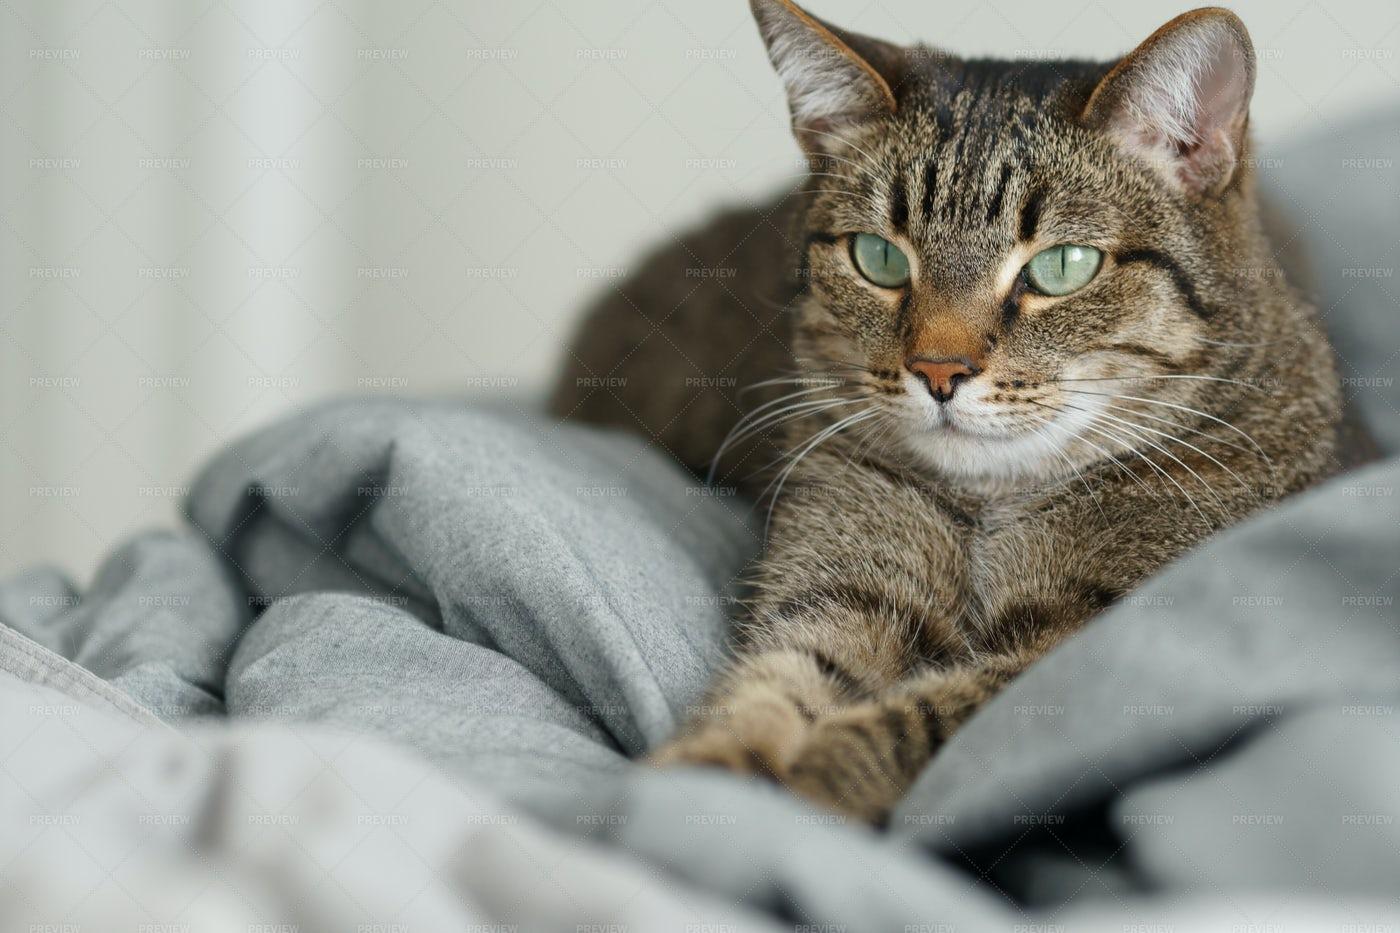 Housecat Among The Sheets: Stock Photos